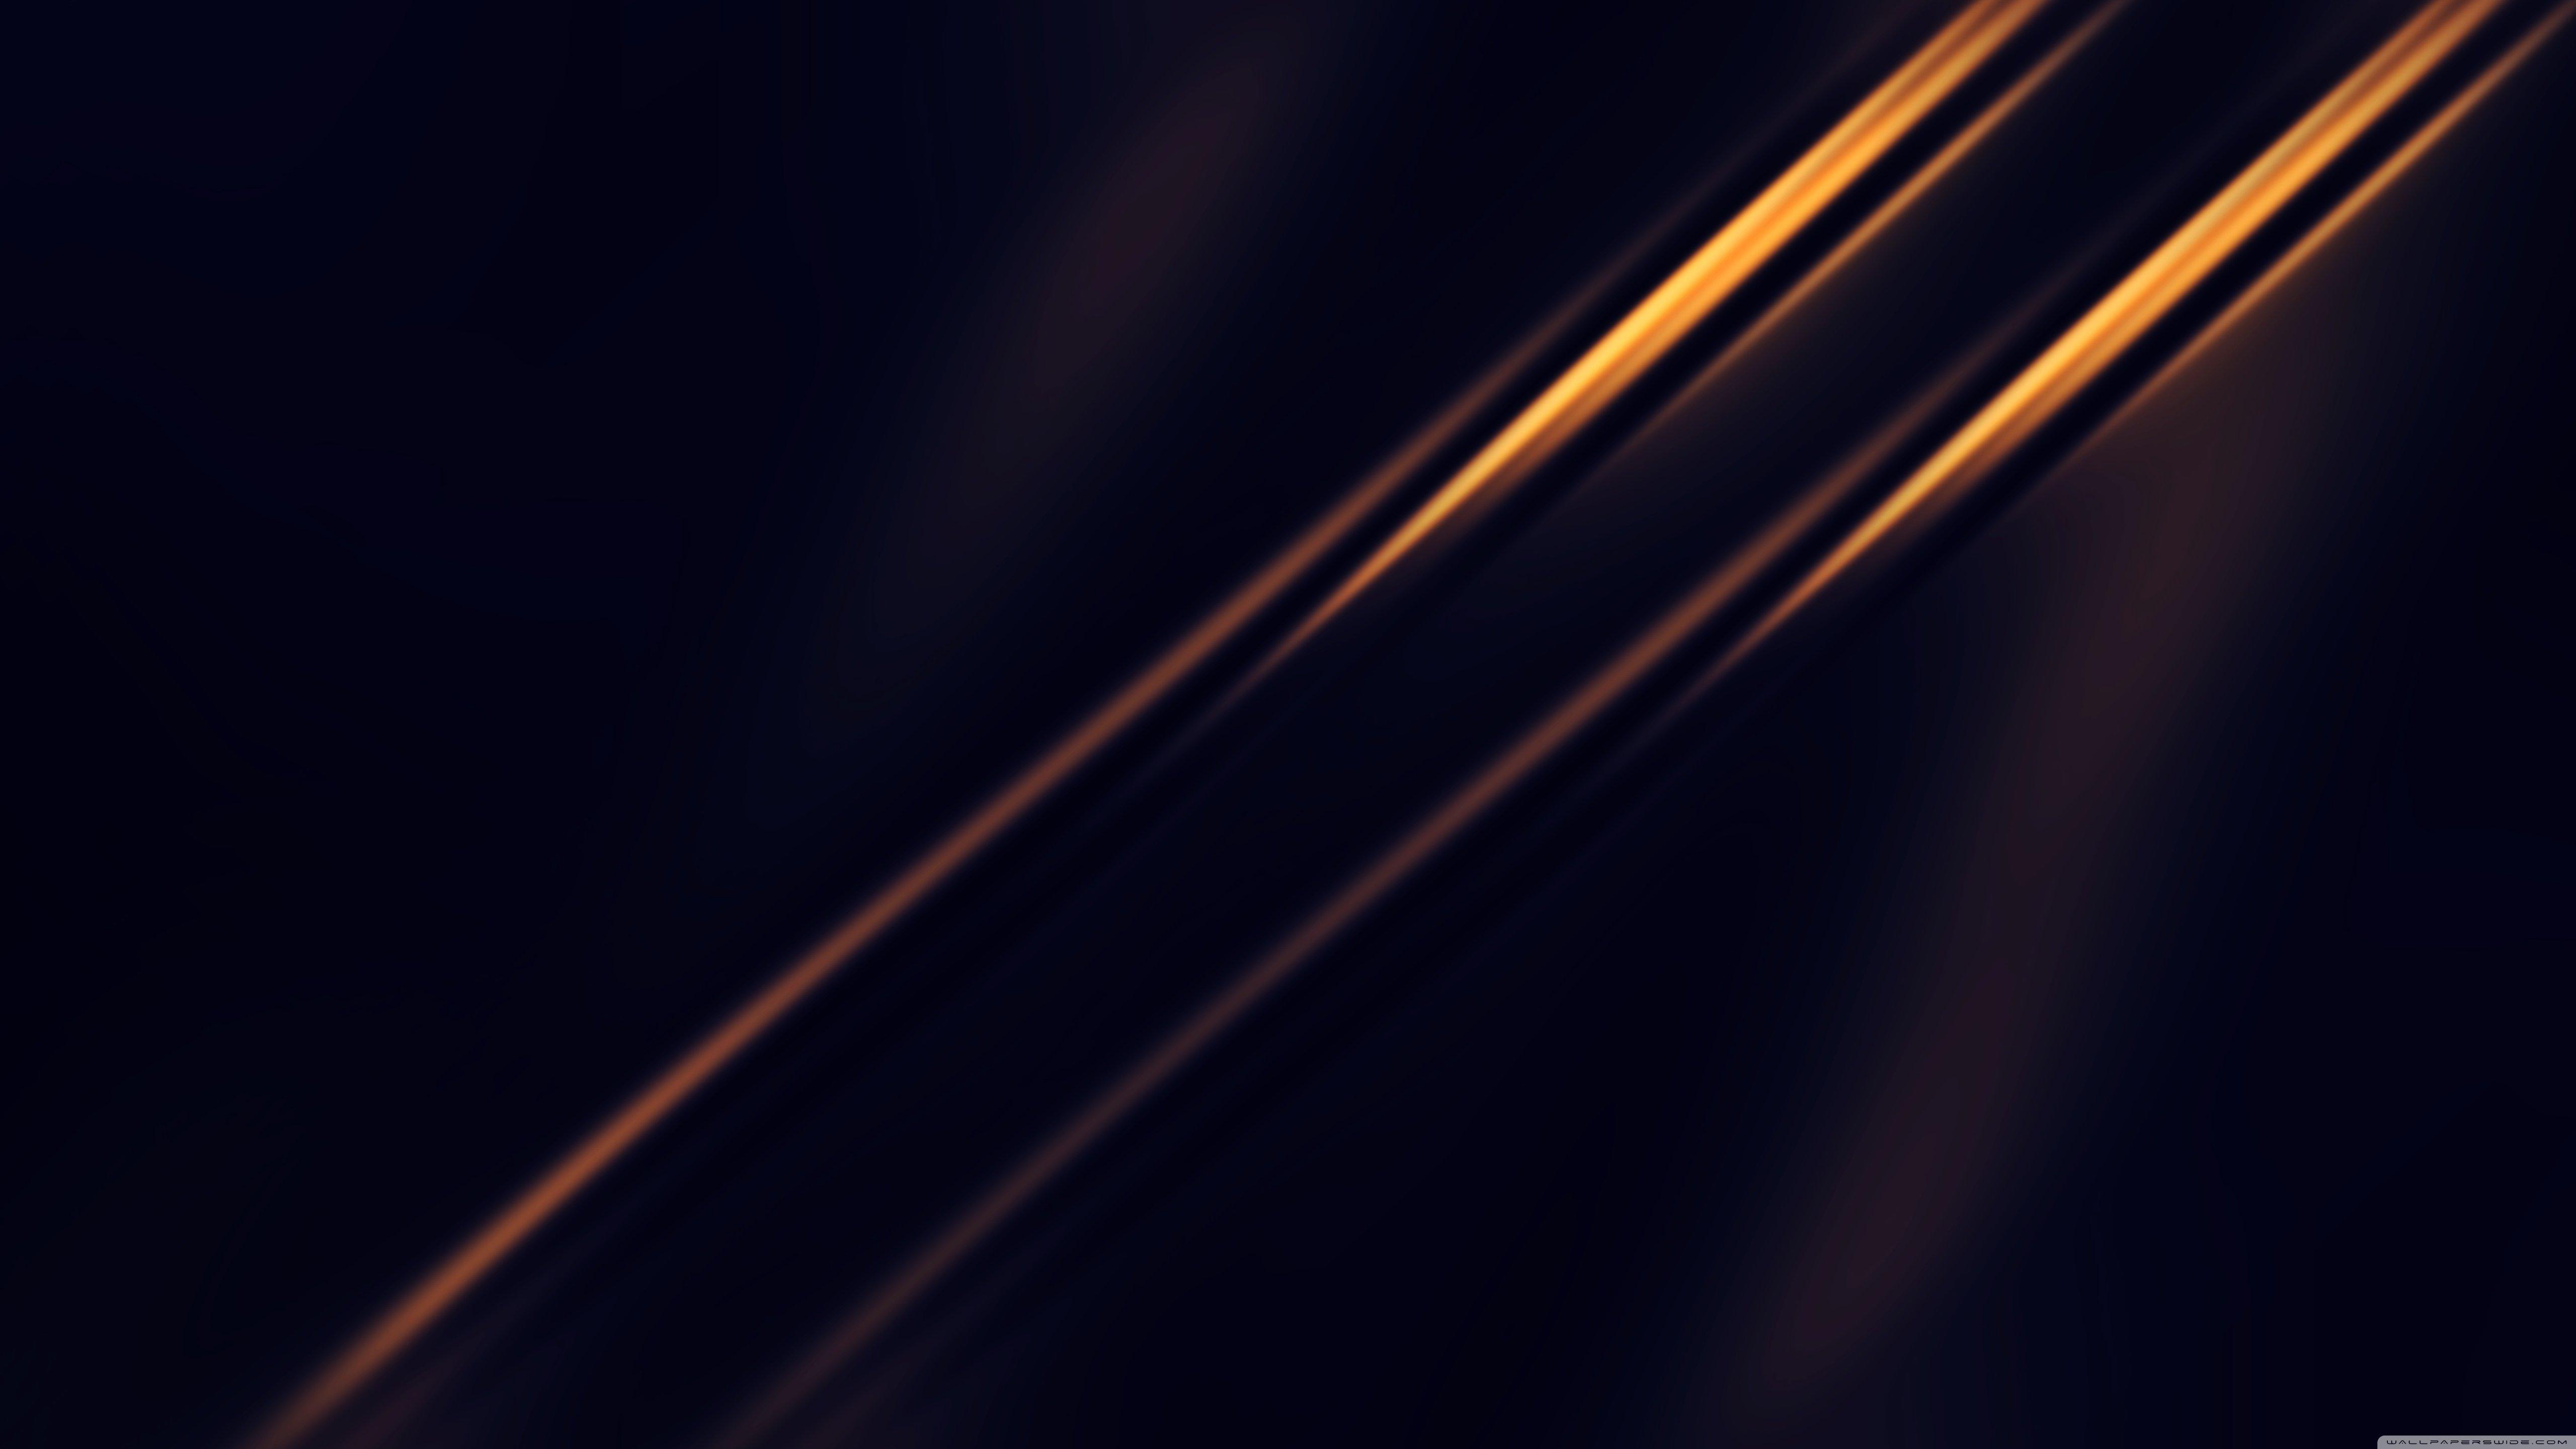 Free Download Wallpapers Hd Black 5120x2880 For Your Desktop Mobile Tablet Explore 74 Dark Wallpaper Hd Black Background Wallpaper Dark Blue Wallpaper Dark Wallpapers For Desktop